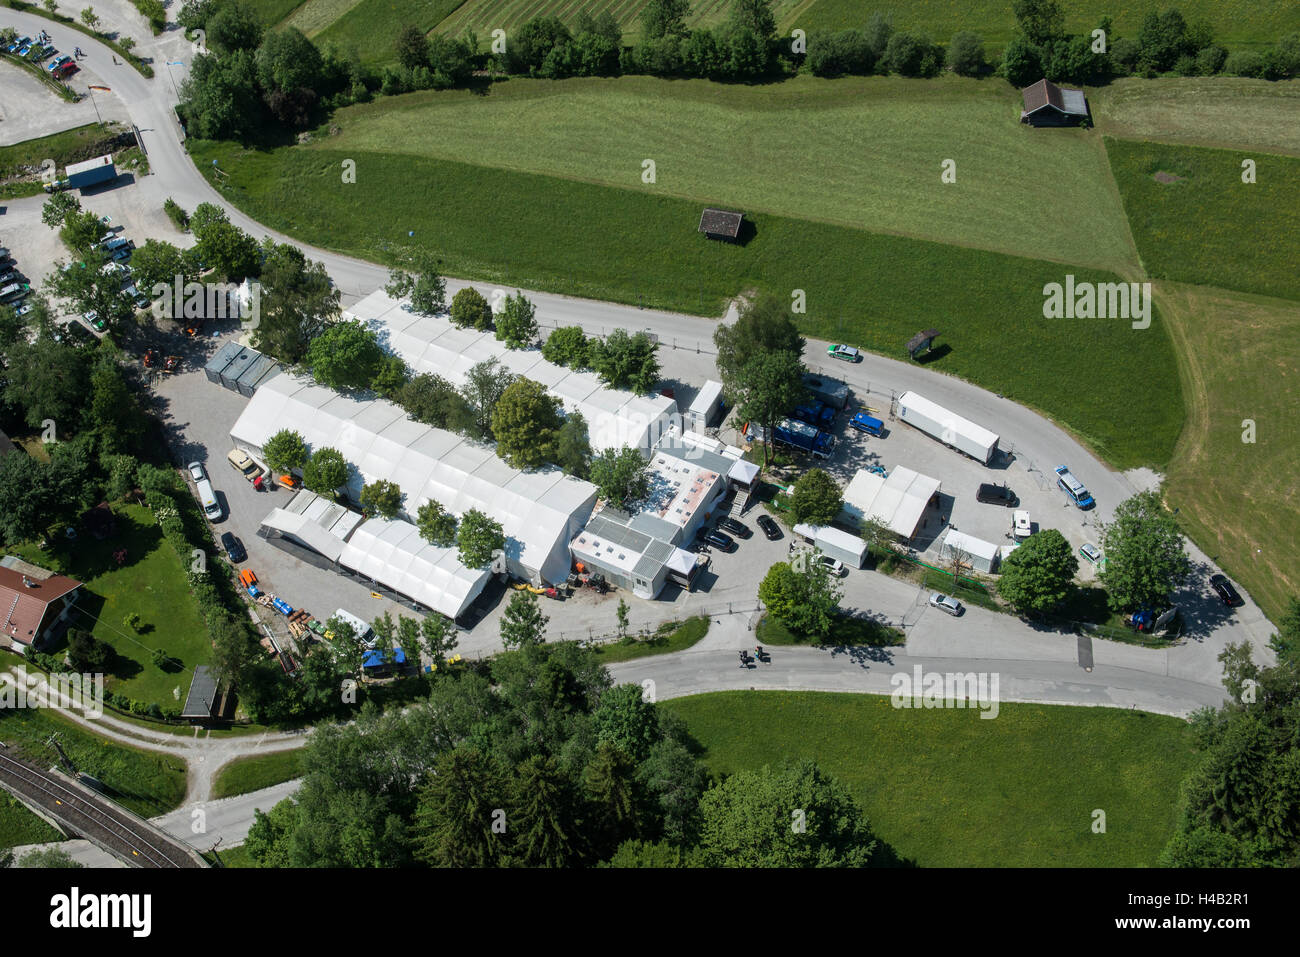 G7 summit 2015 on castle Elmau, Garmisch-Partenkirchen, resupply station of the police, Kreuzeck parking lot, Osterfeld - Stock Image